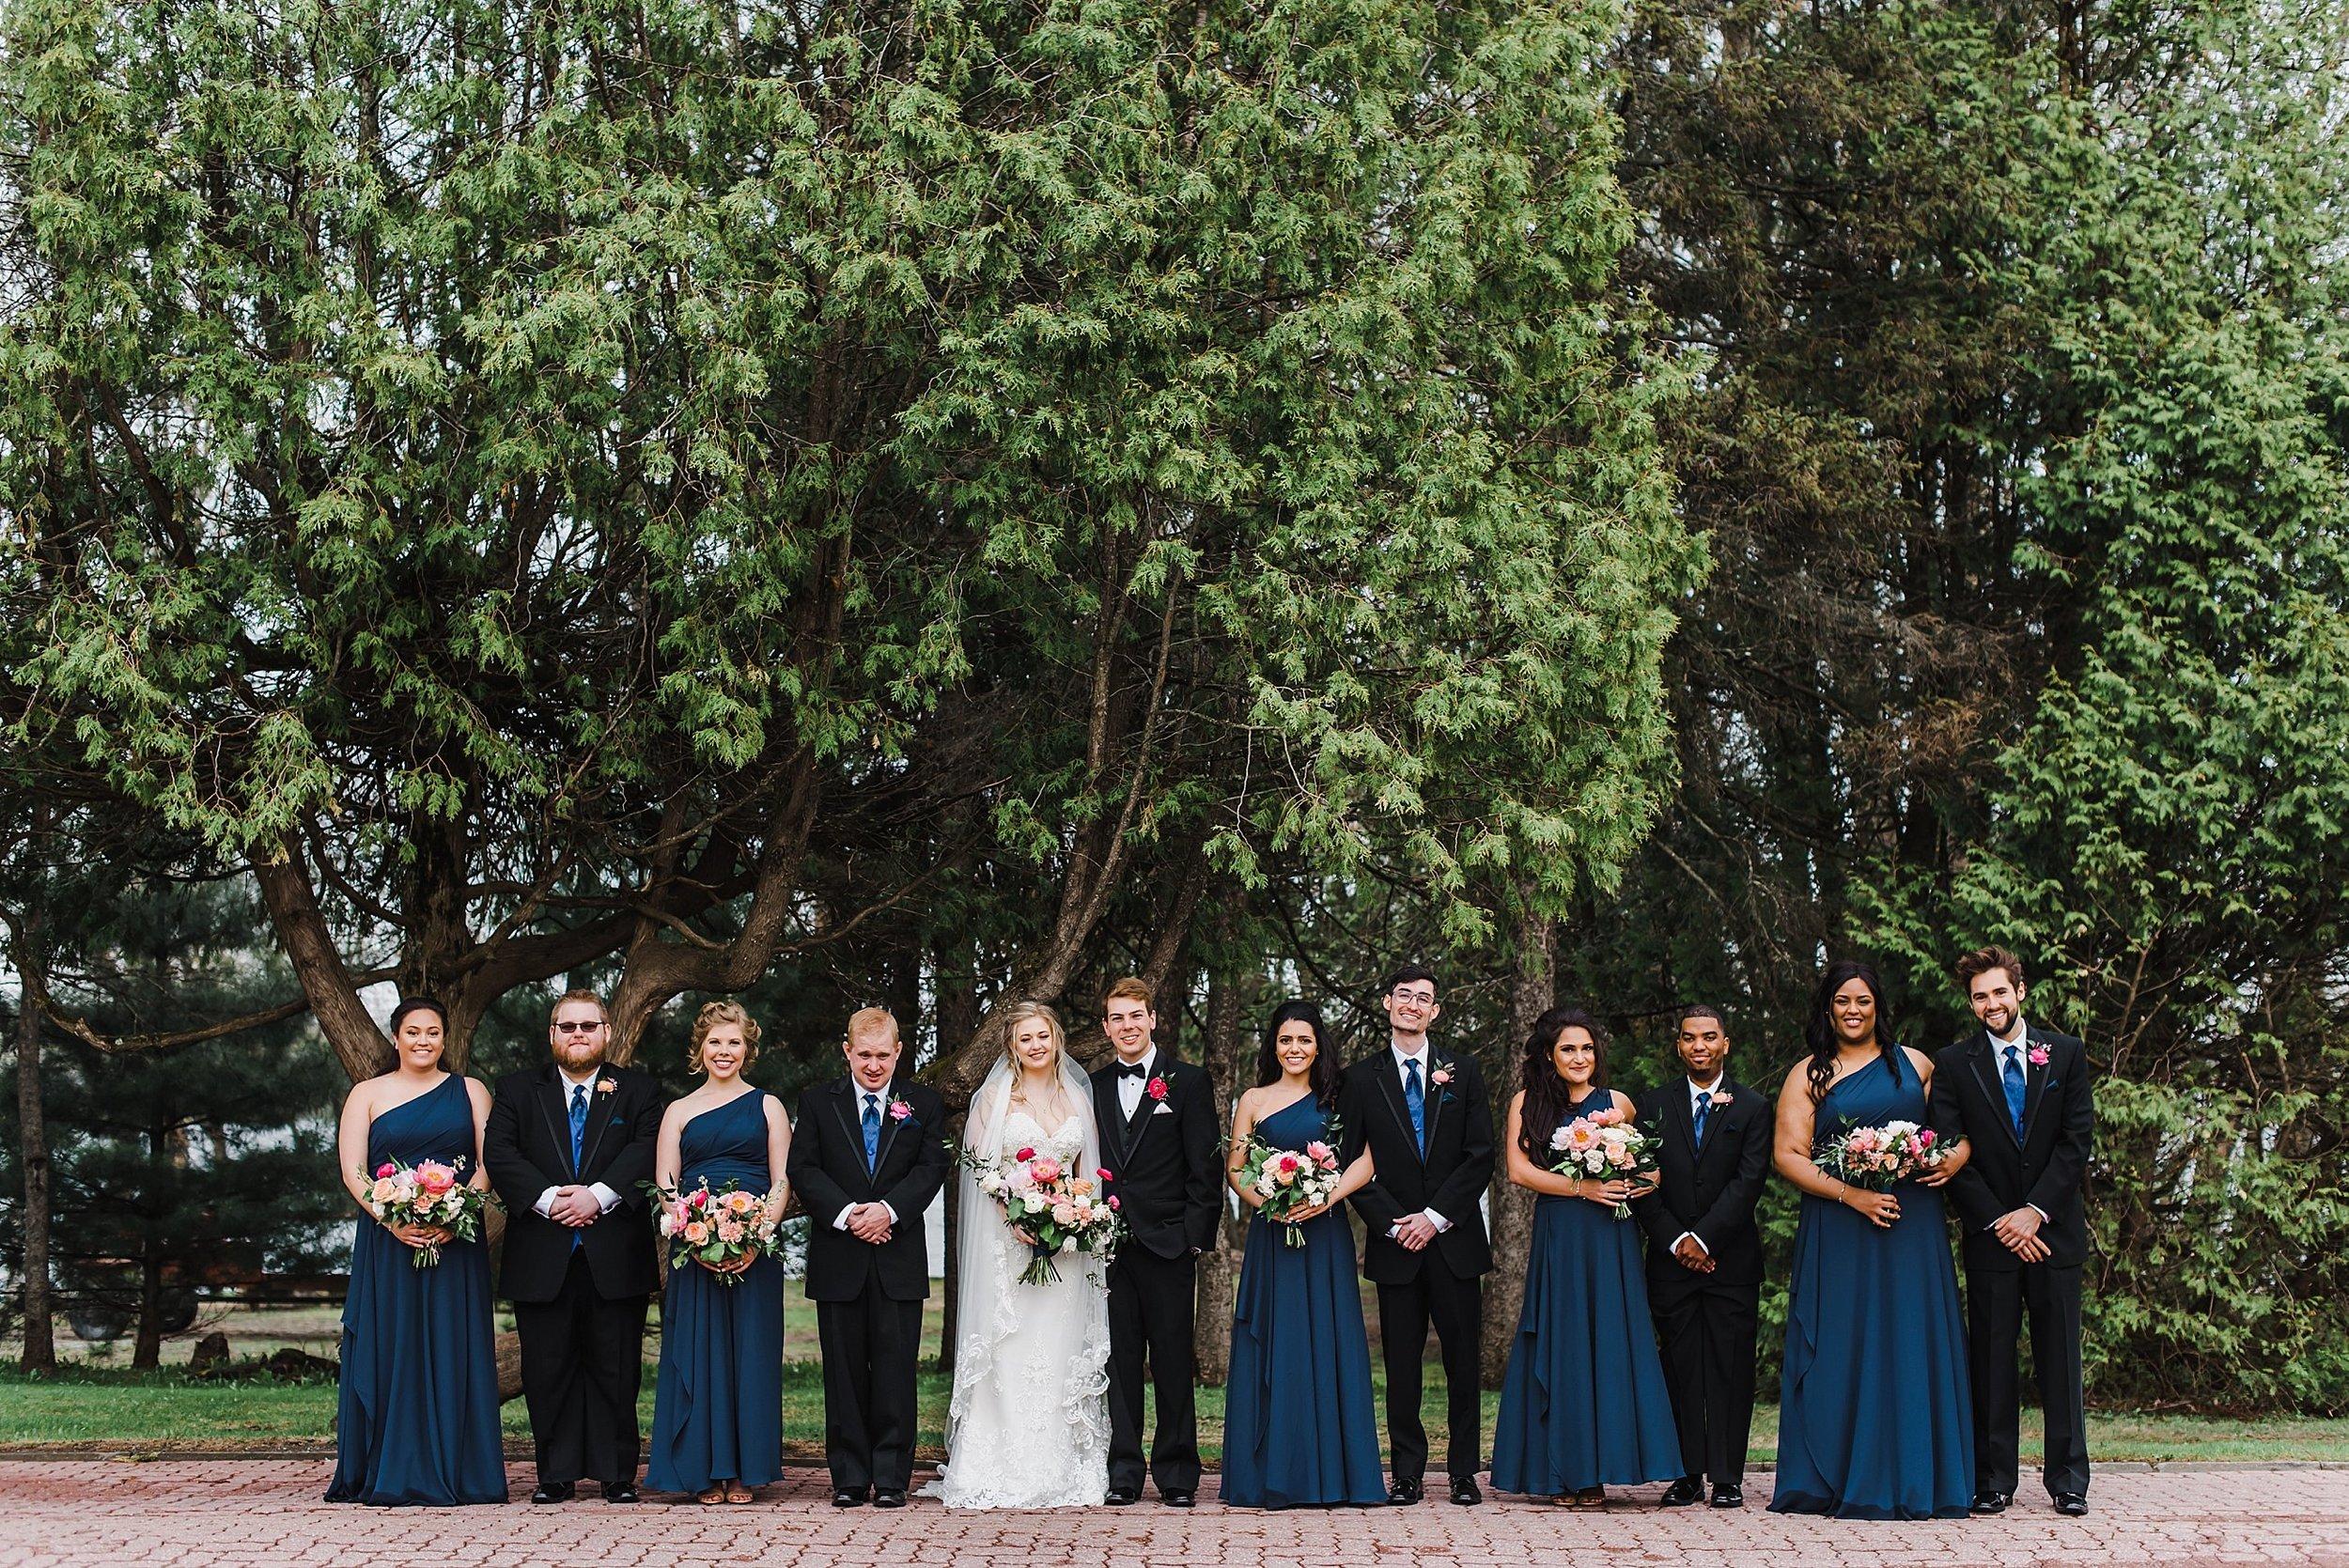 light airy indie fine art ottawa wedding photographer | Ali and Batoul Photography_0176.jpg